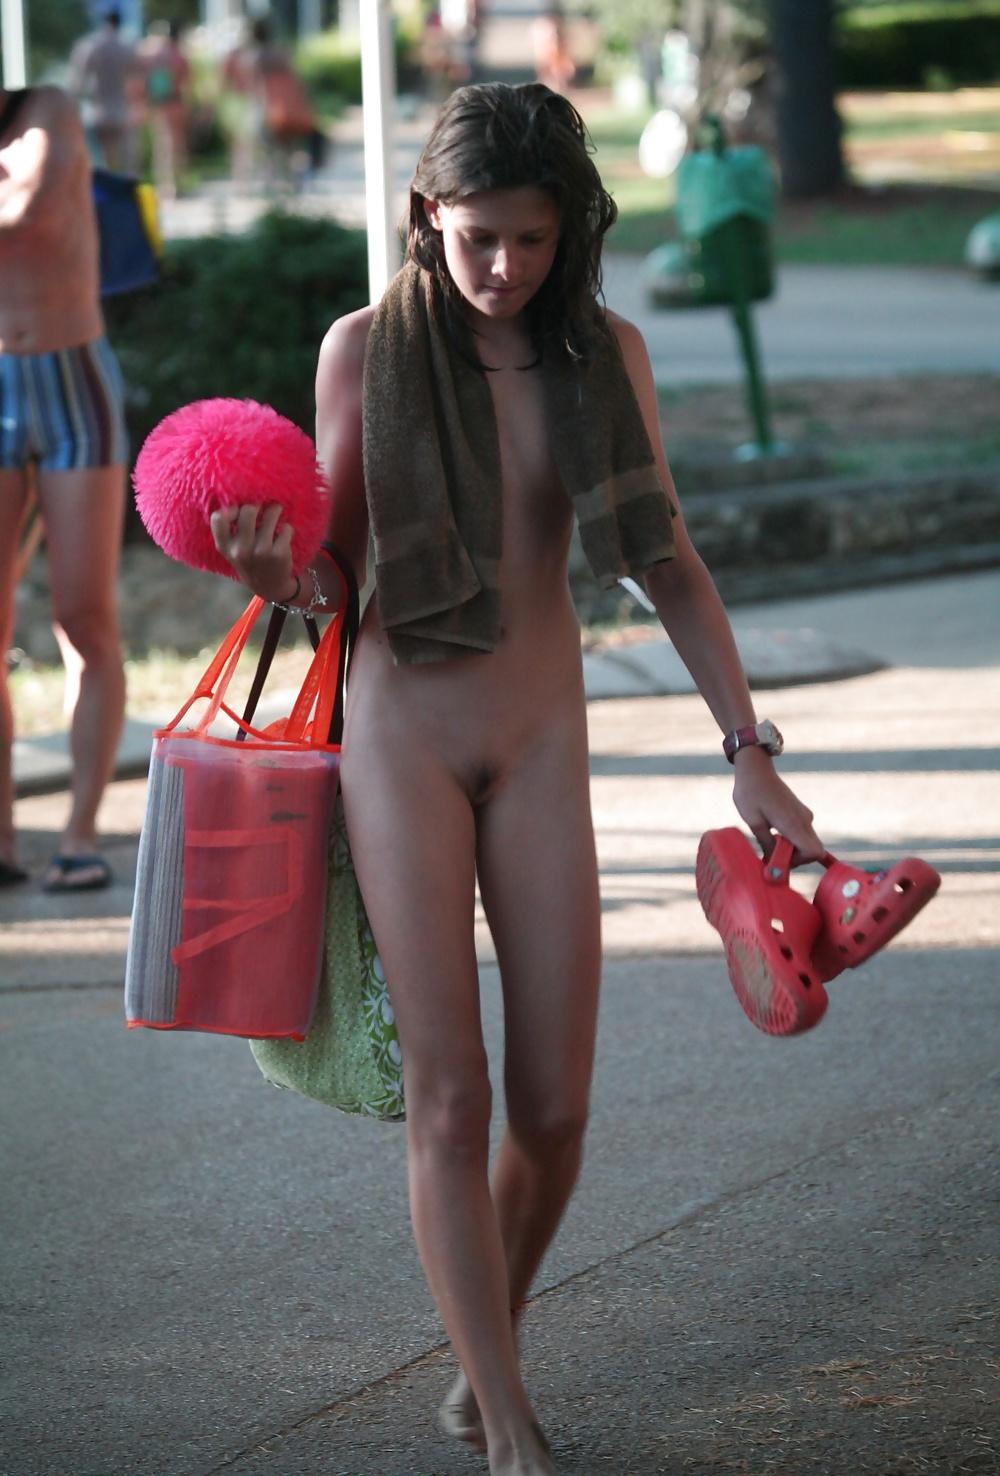 beach nudity